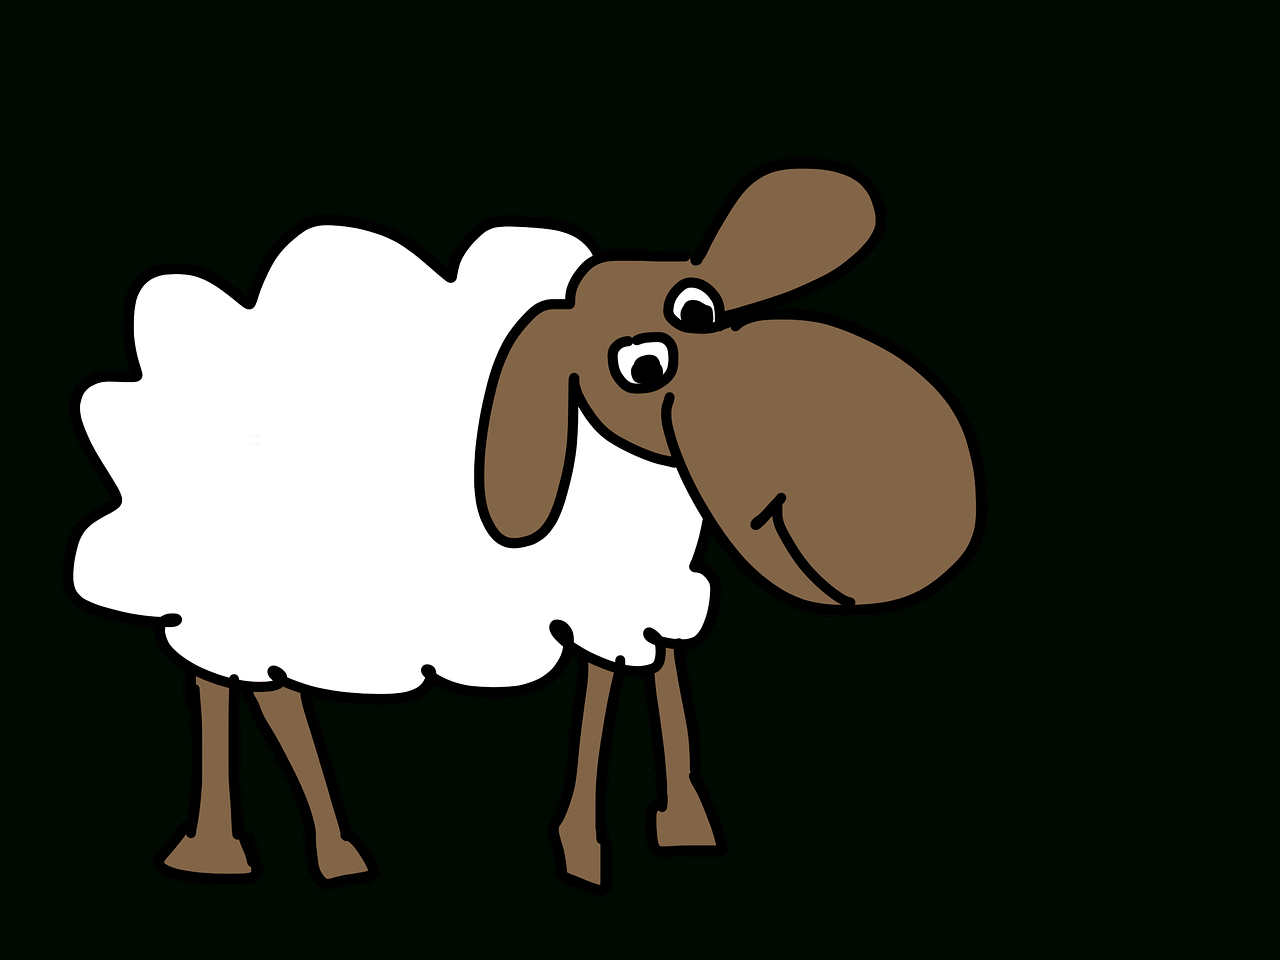 Domba Gambar Kartun Wol – Gambar Gratis Di Pixabay with regard to Gambar Domba Animasi